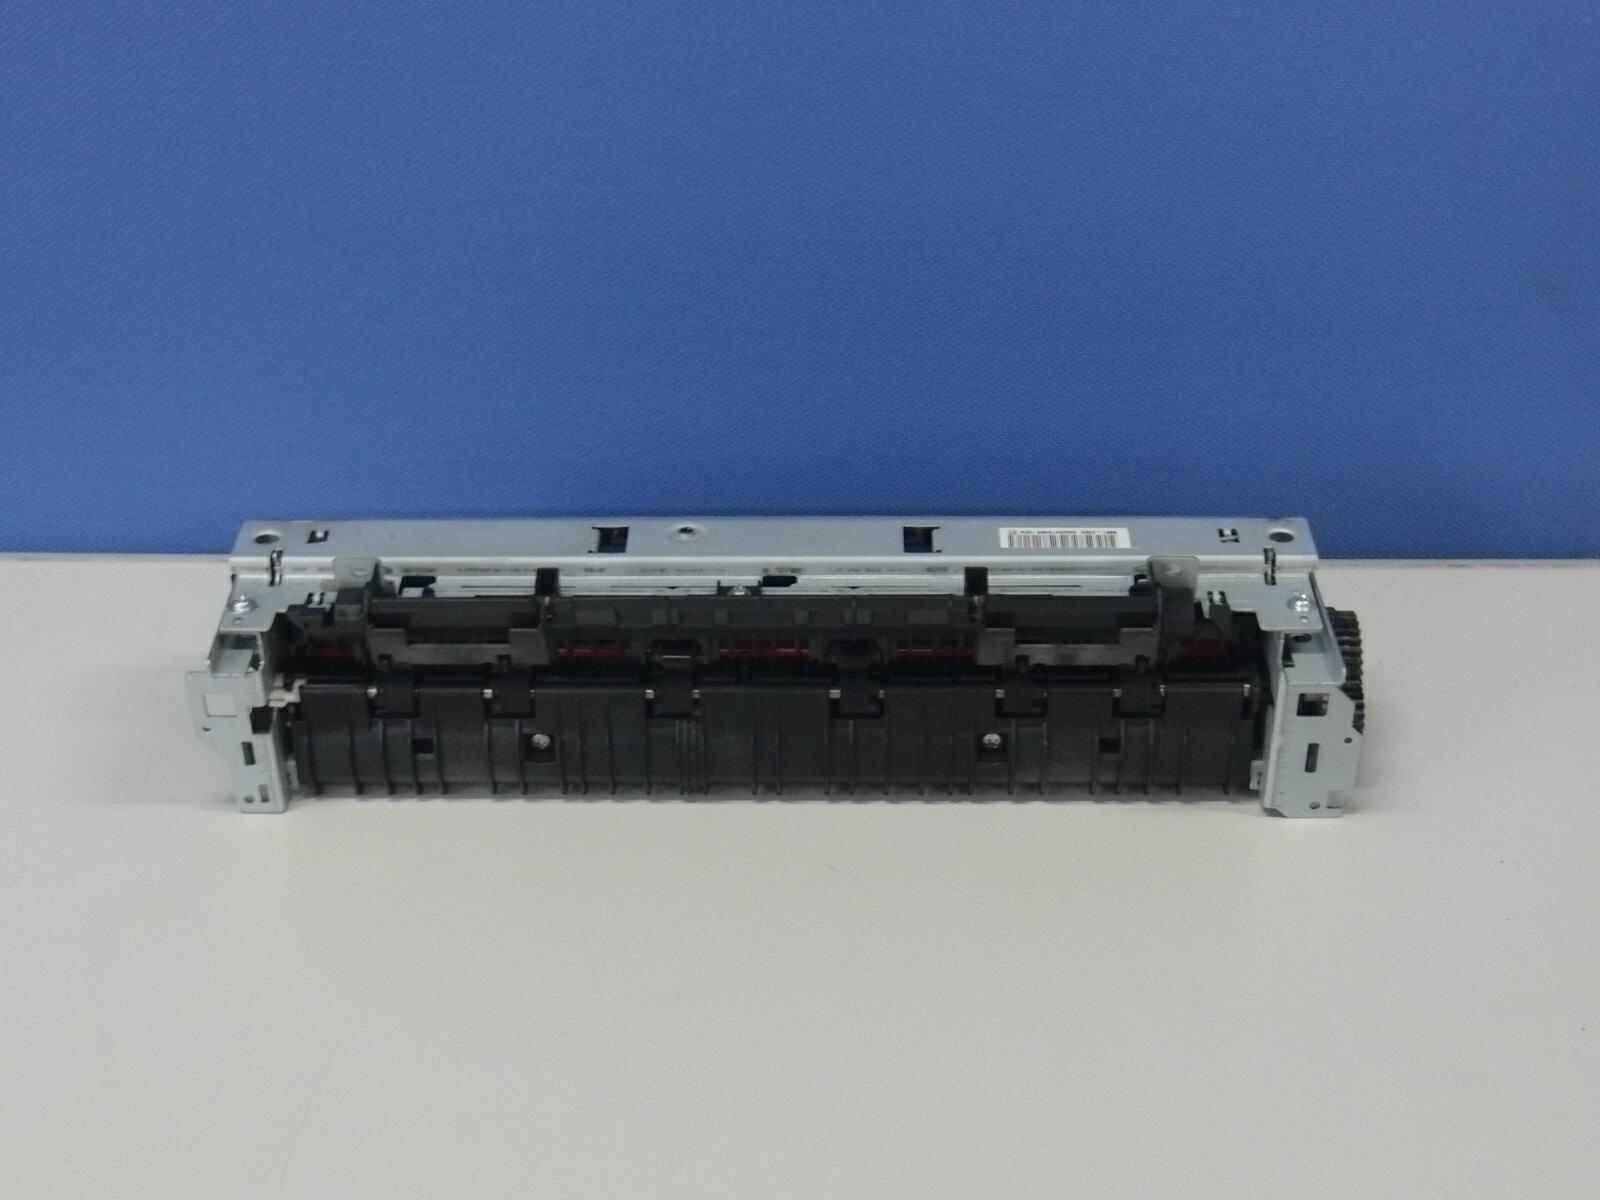 LBP3500/LBP3900/3910/3920/3930/3950/3970 Canon 定着ユニット【中古】【全品送料無料セール中!】